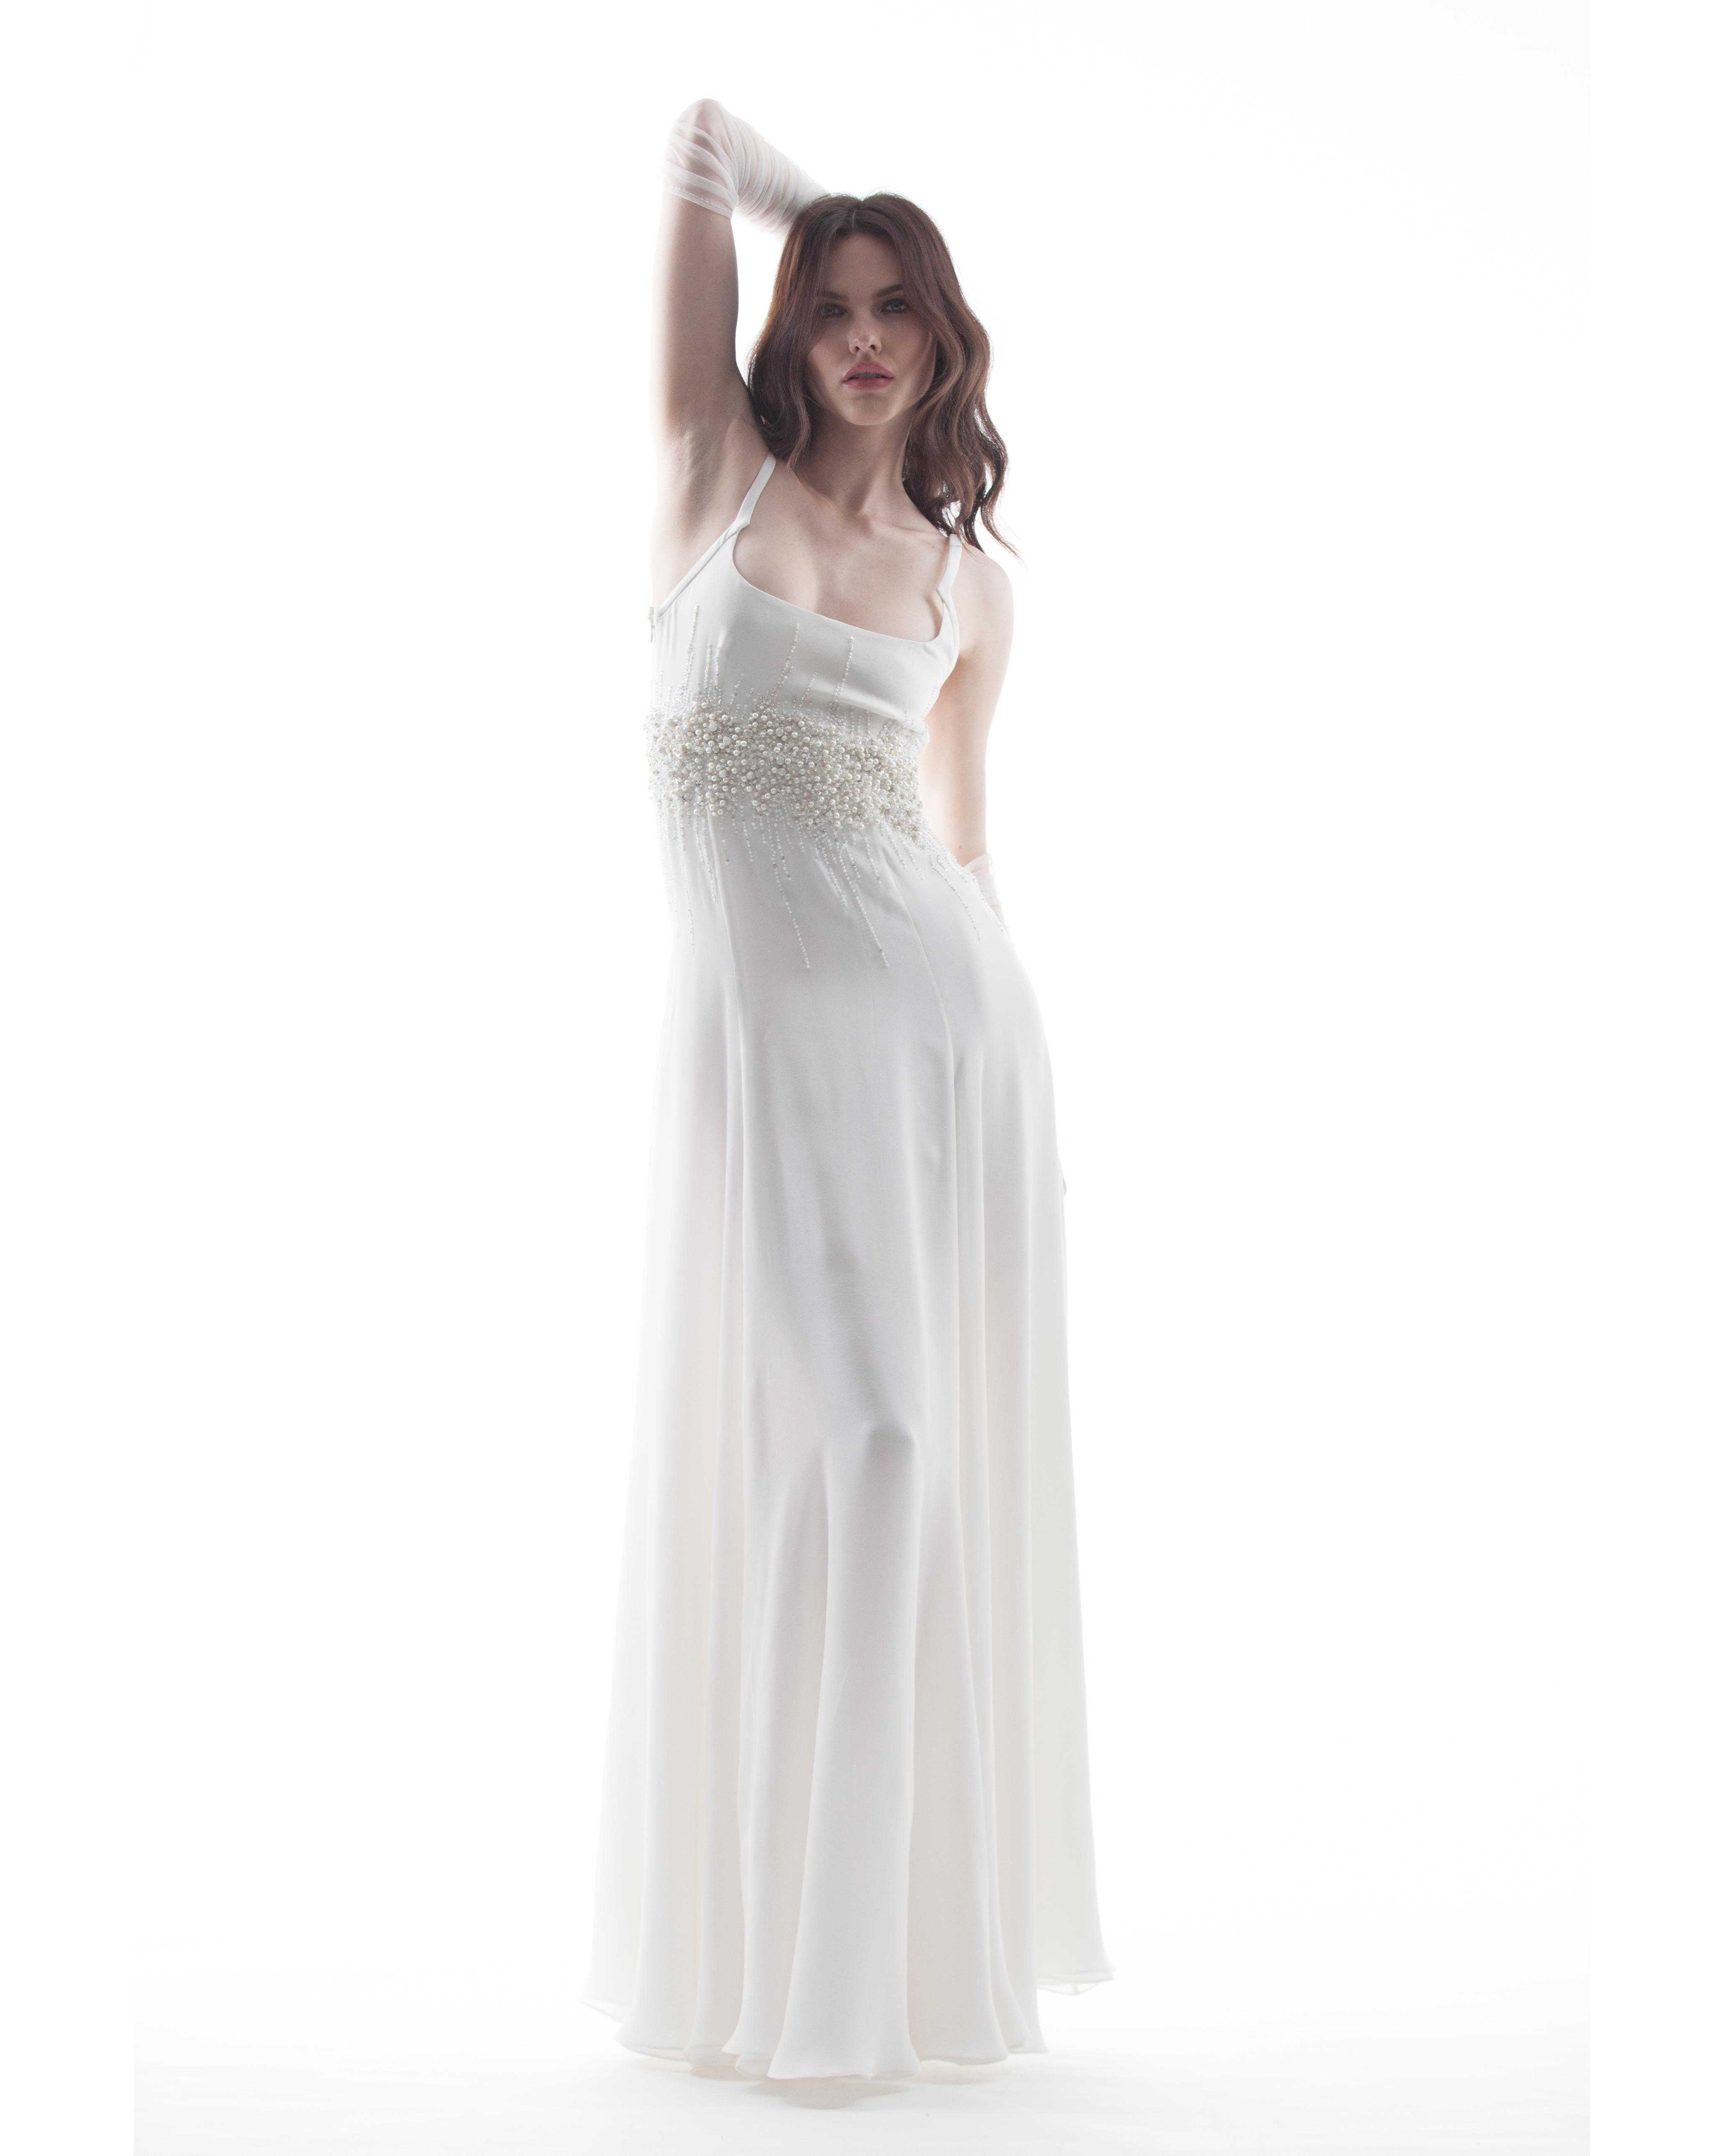 houghton wedding dress spring 2018